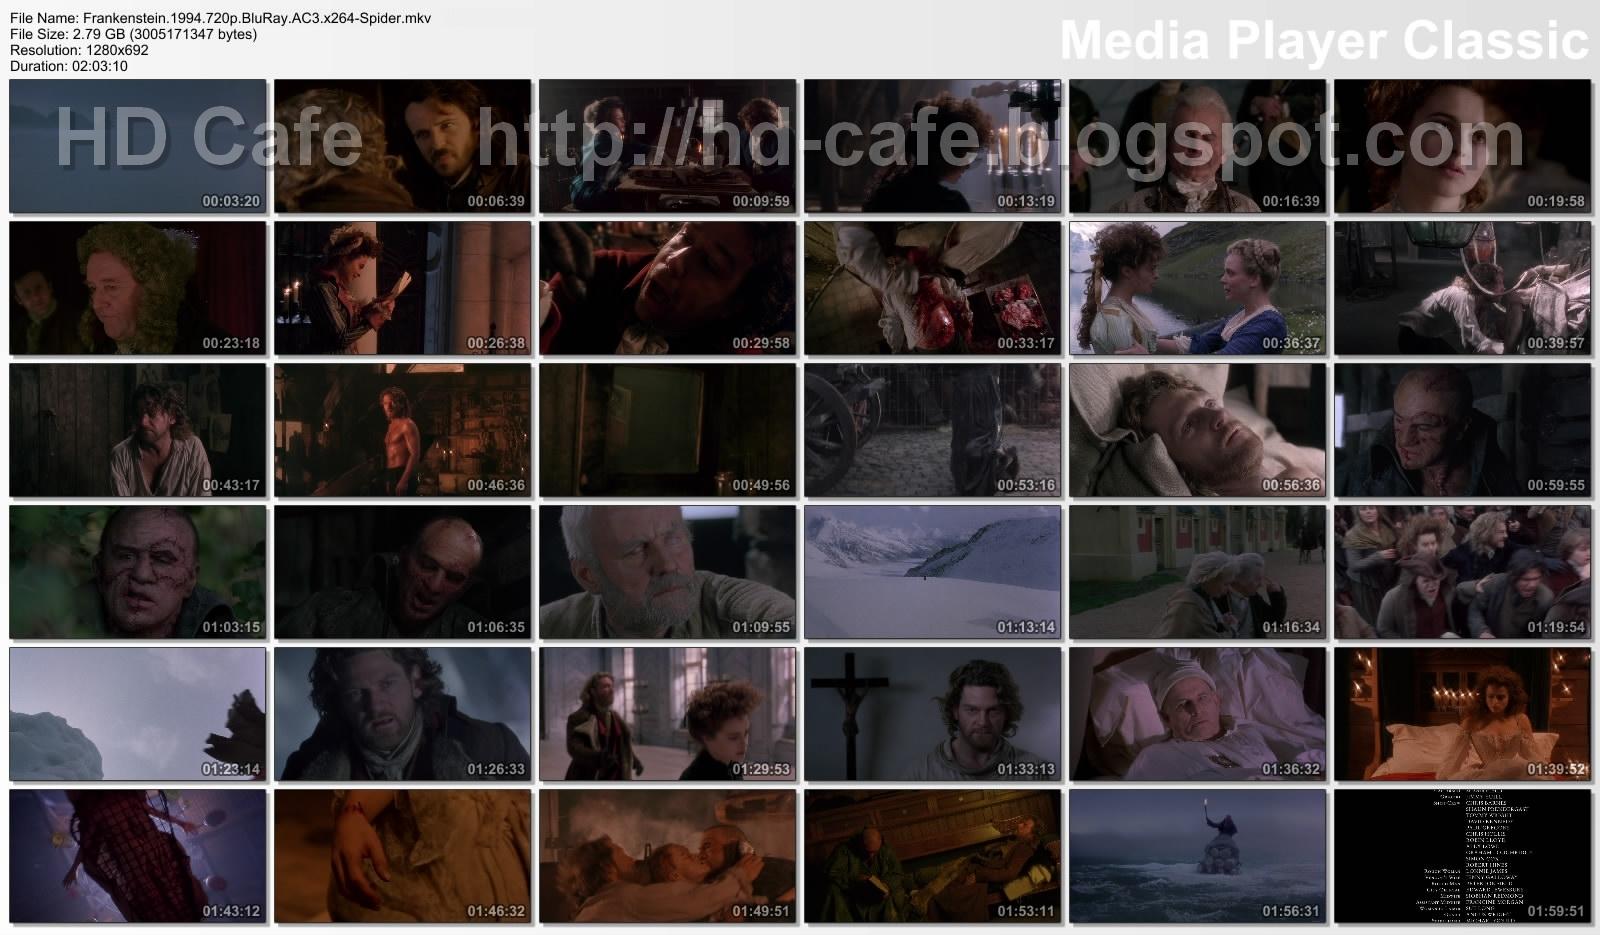 http://3.bp.blogspot.com/-71NVrlV6MI4/TsuG_il3D2I/AAAAAAAACCo/ntvx0MnQi70/s1600/Frankenstein-1994-thumbs.jpg